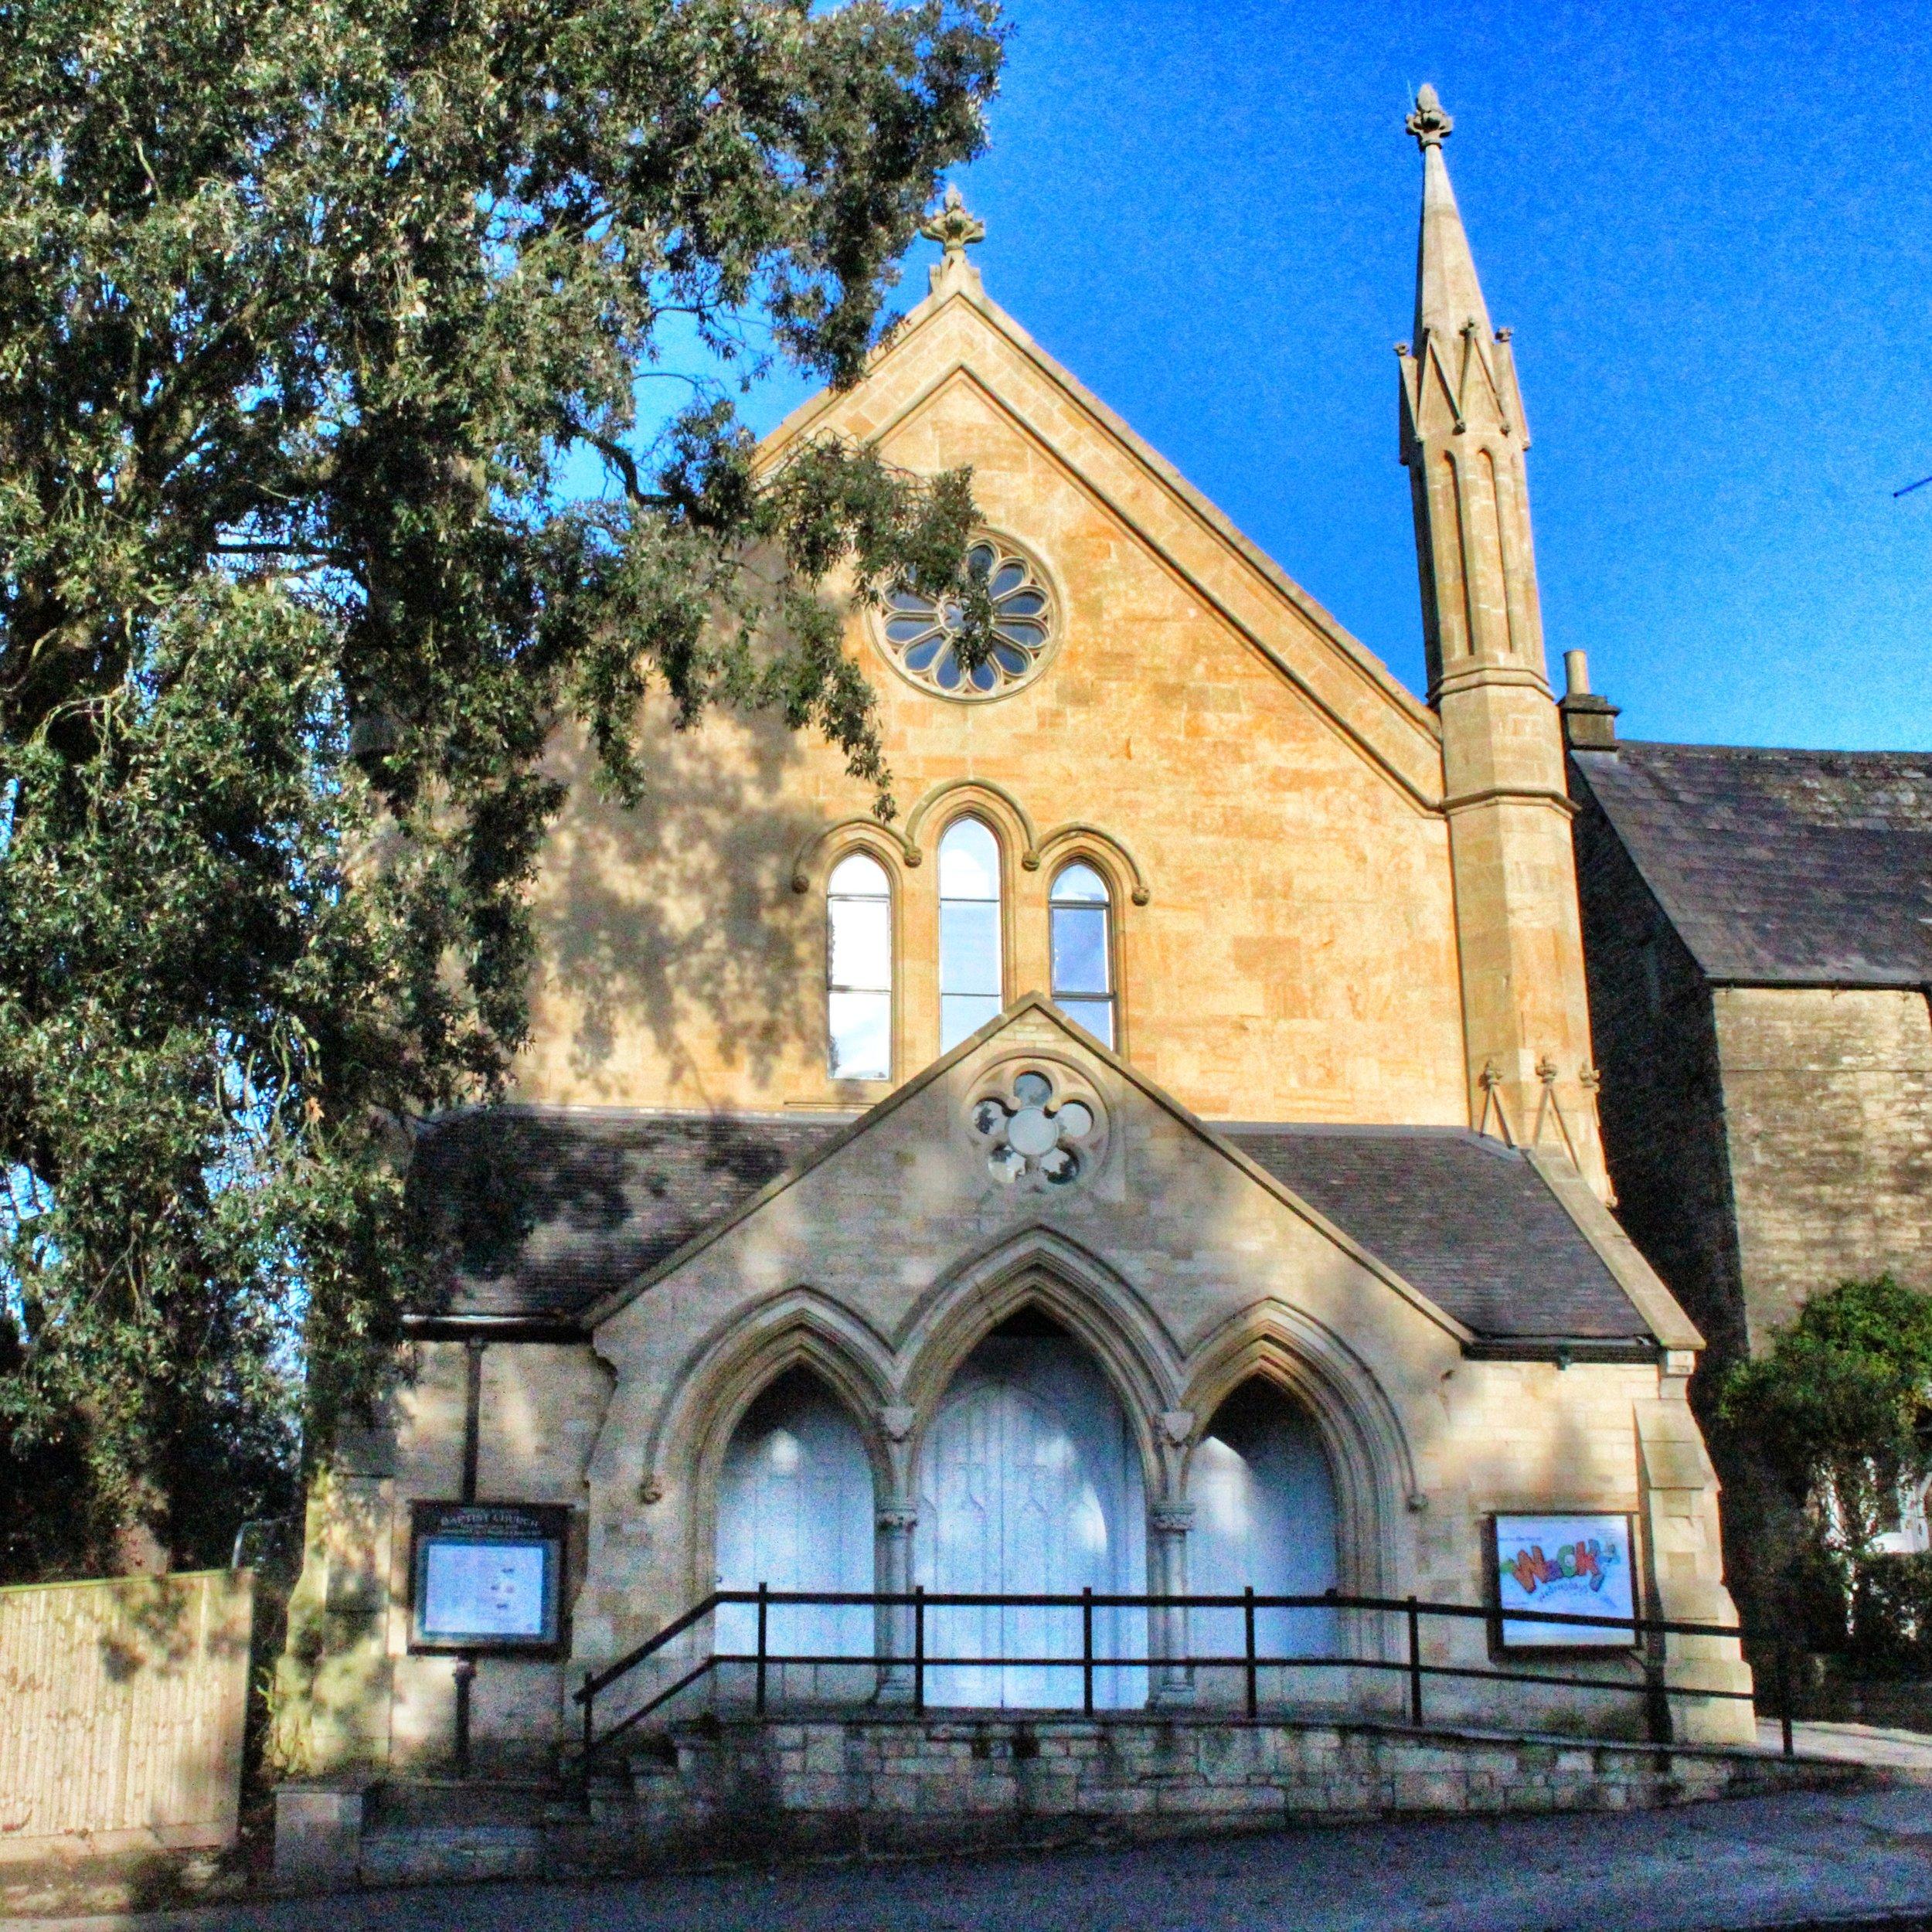 Chipping Norton Baptist Chapel